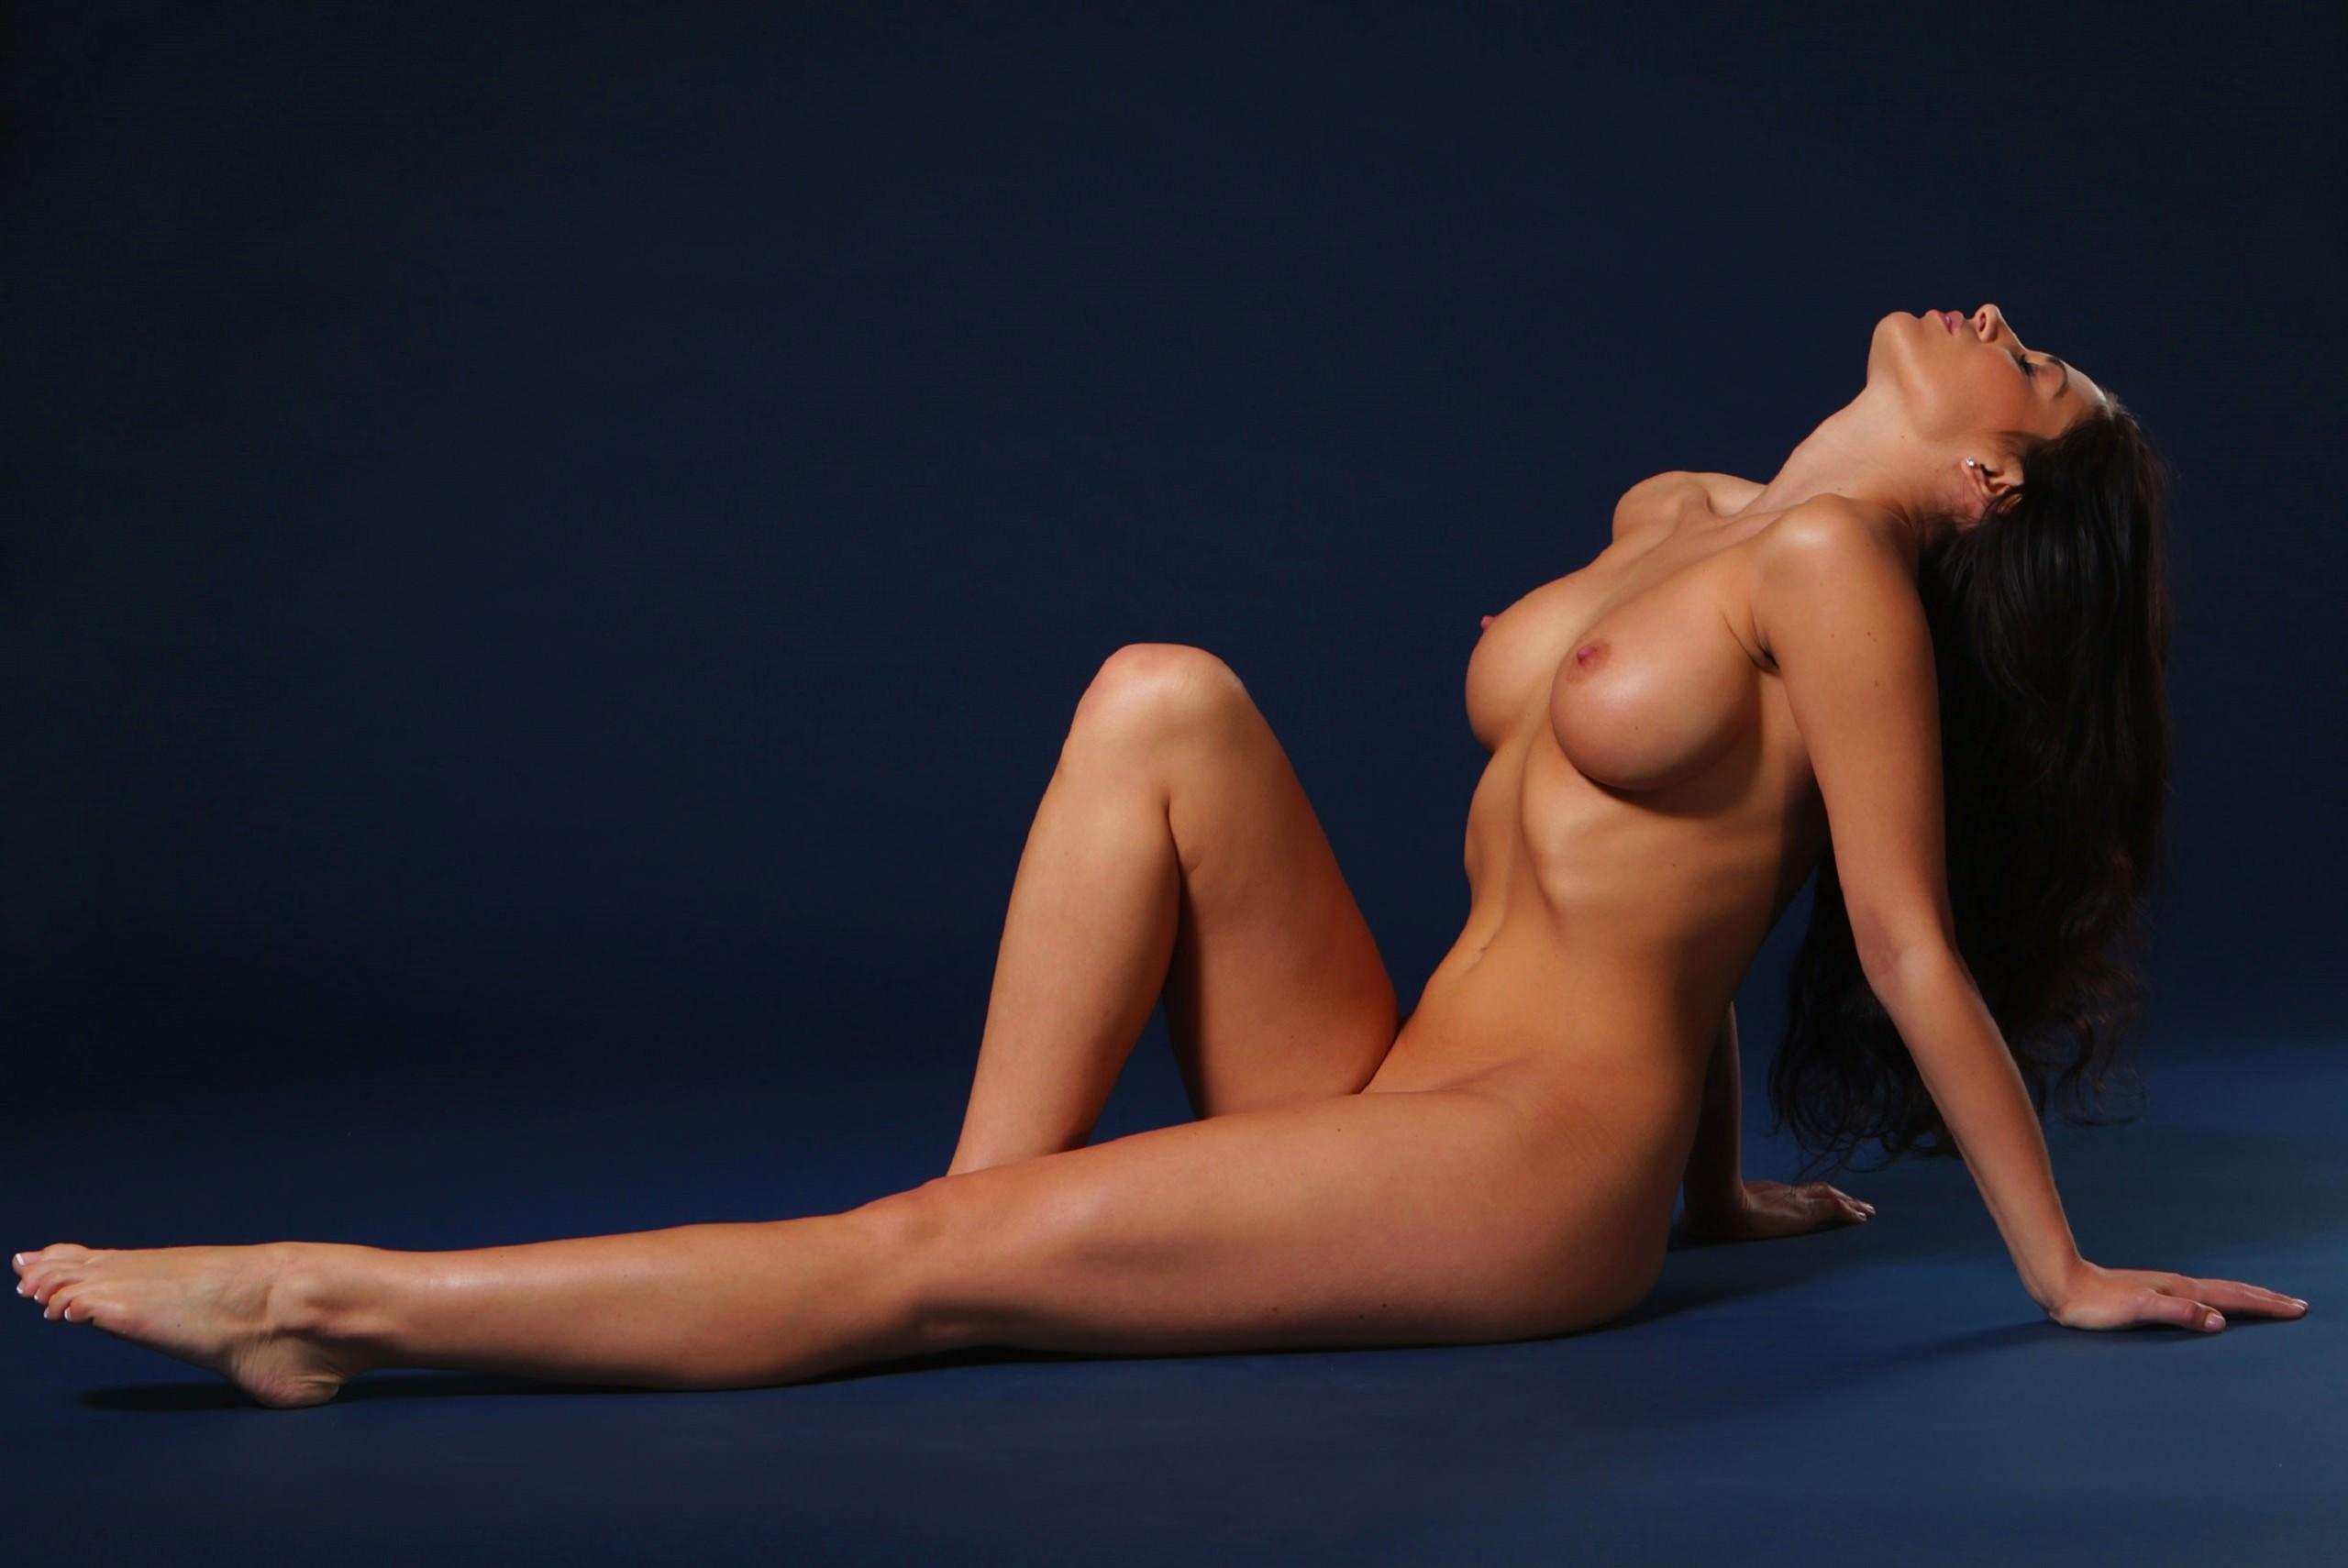 Perfect Female Figure Nude Pornportal Free Spinnerslongboards